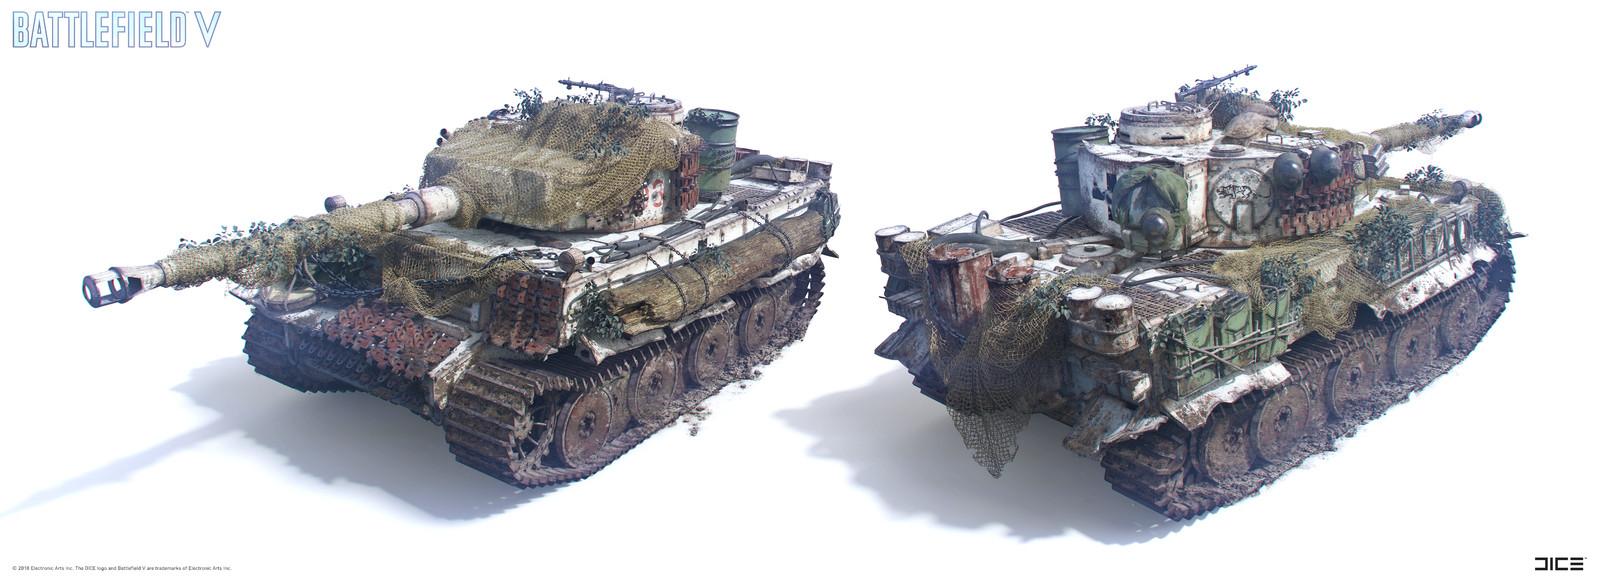 """Battlefield V"" - The Last Tiger - Final Vehicle concept art"